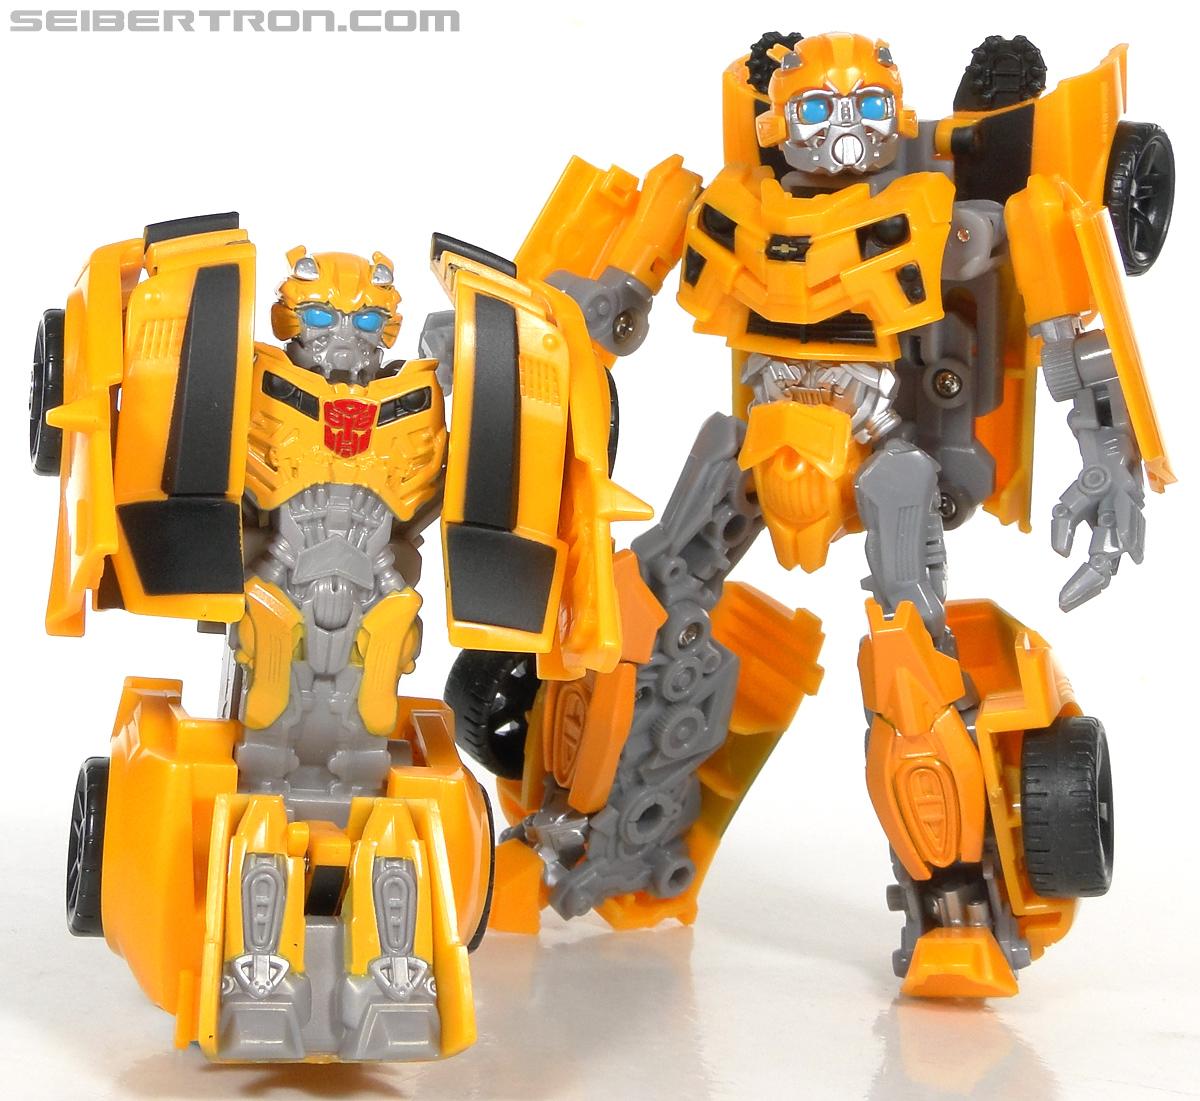 Transformers Dark of the Moon Bumblebee (Image #59 of 67)